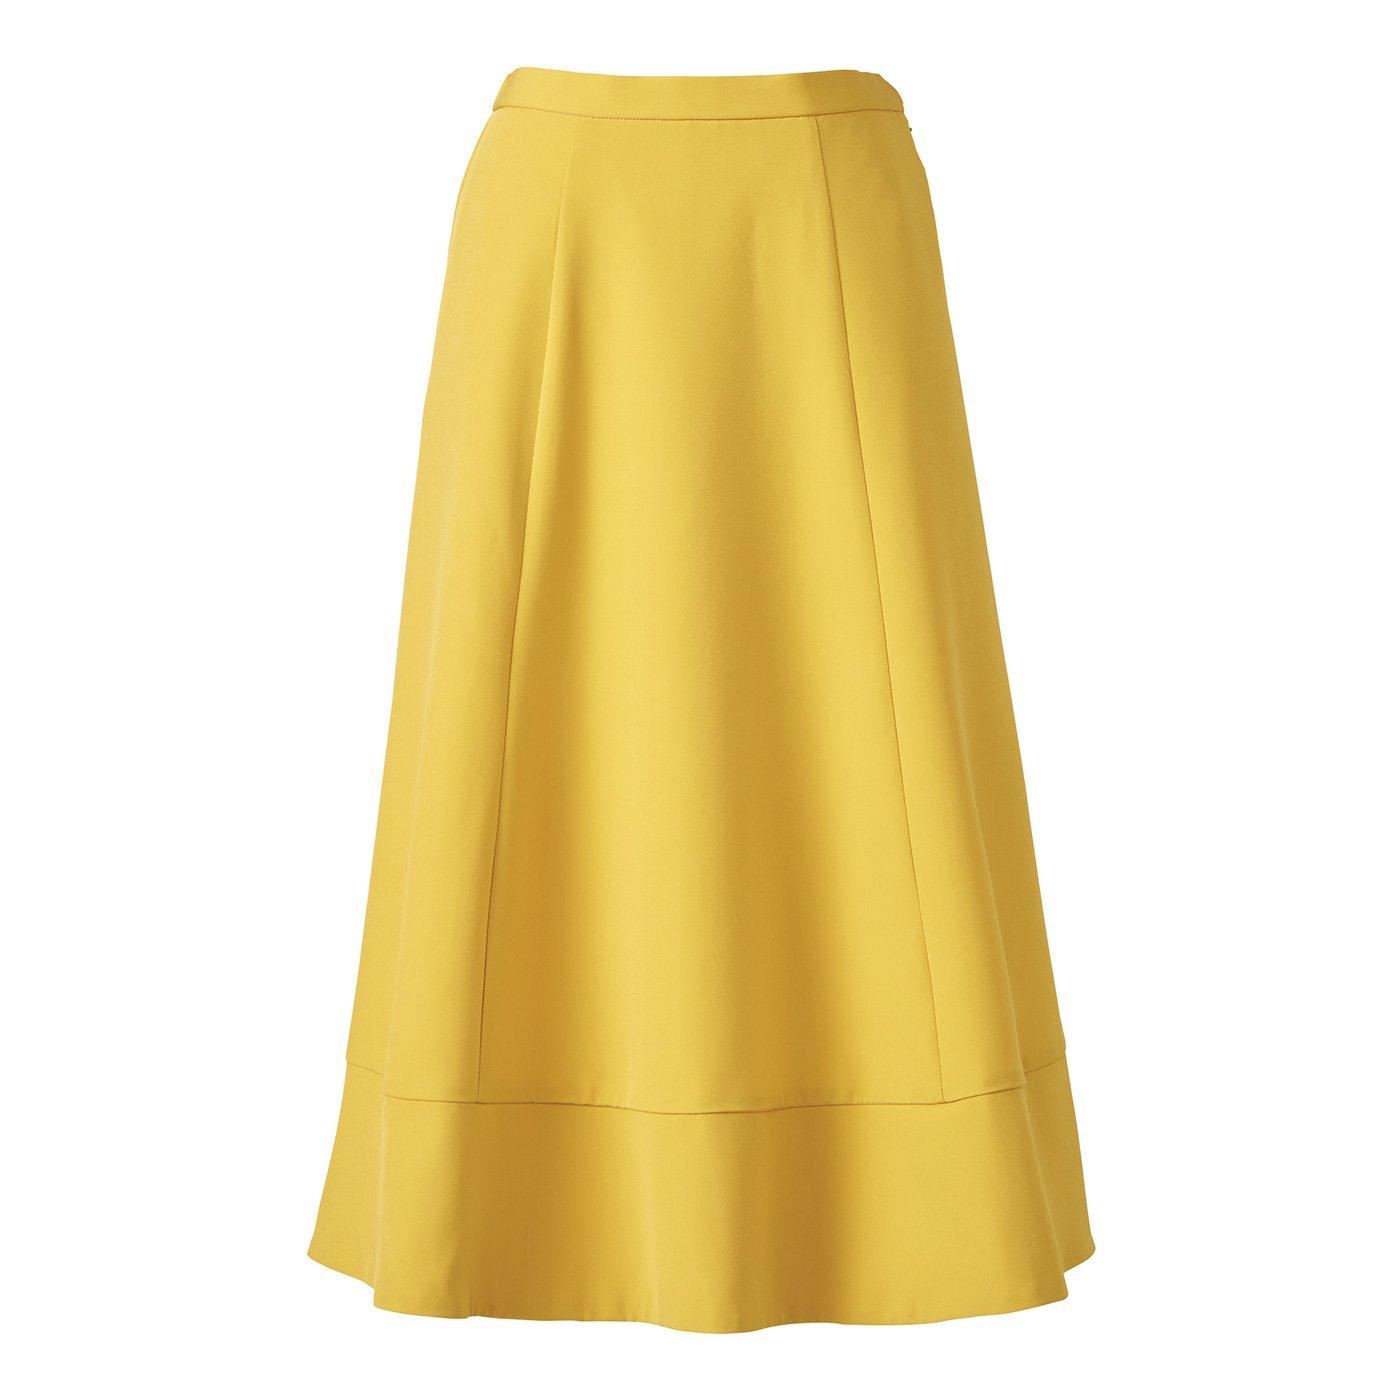 IEDIT[イディット] たっぷりフレアーがドラマティックなミドル丈スカート〈イエロー〉